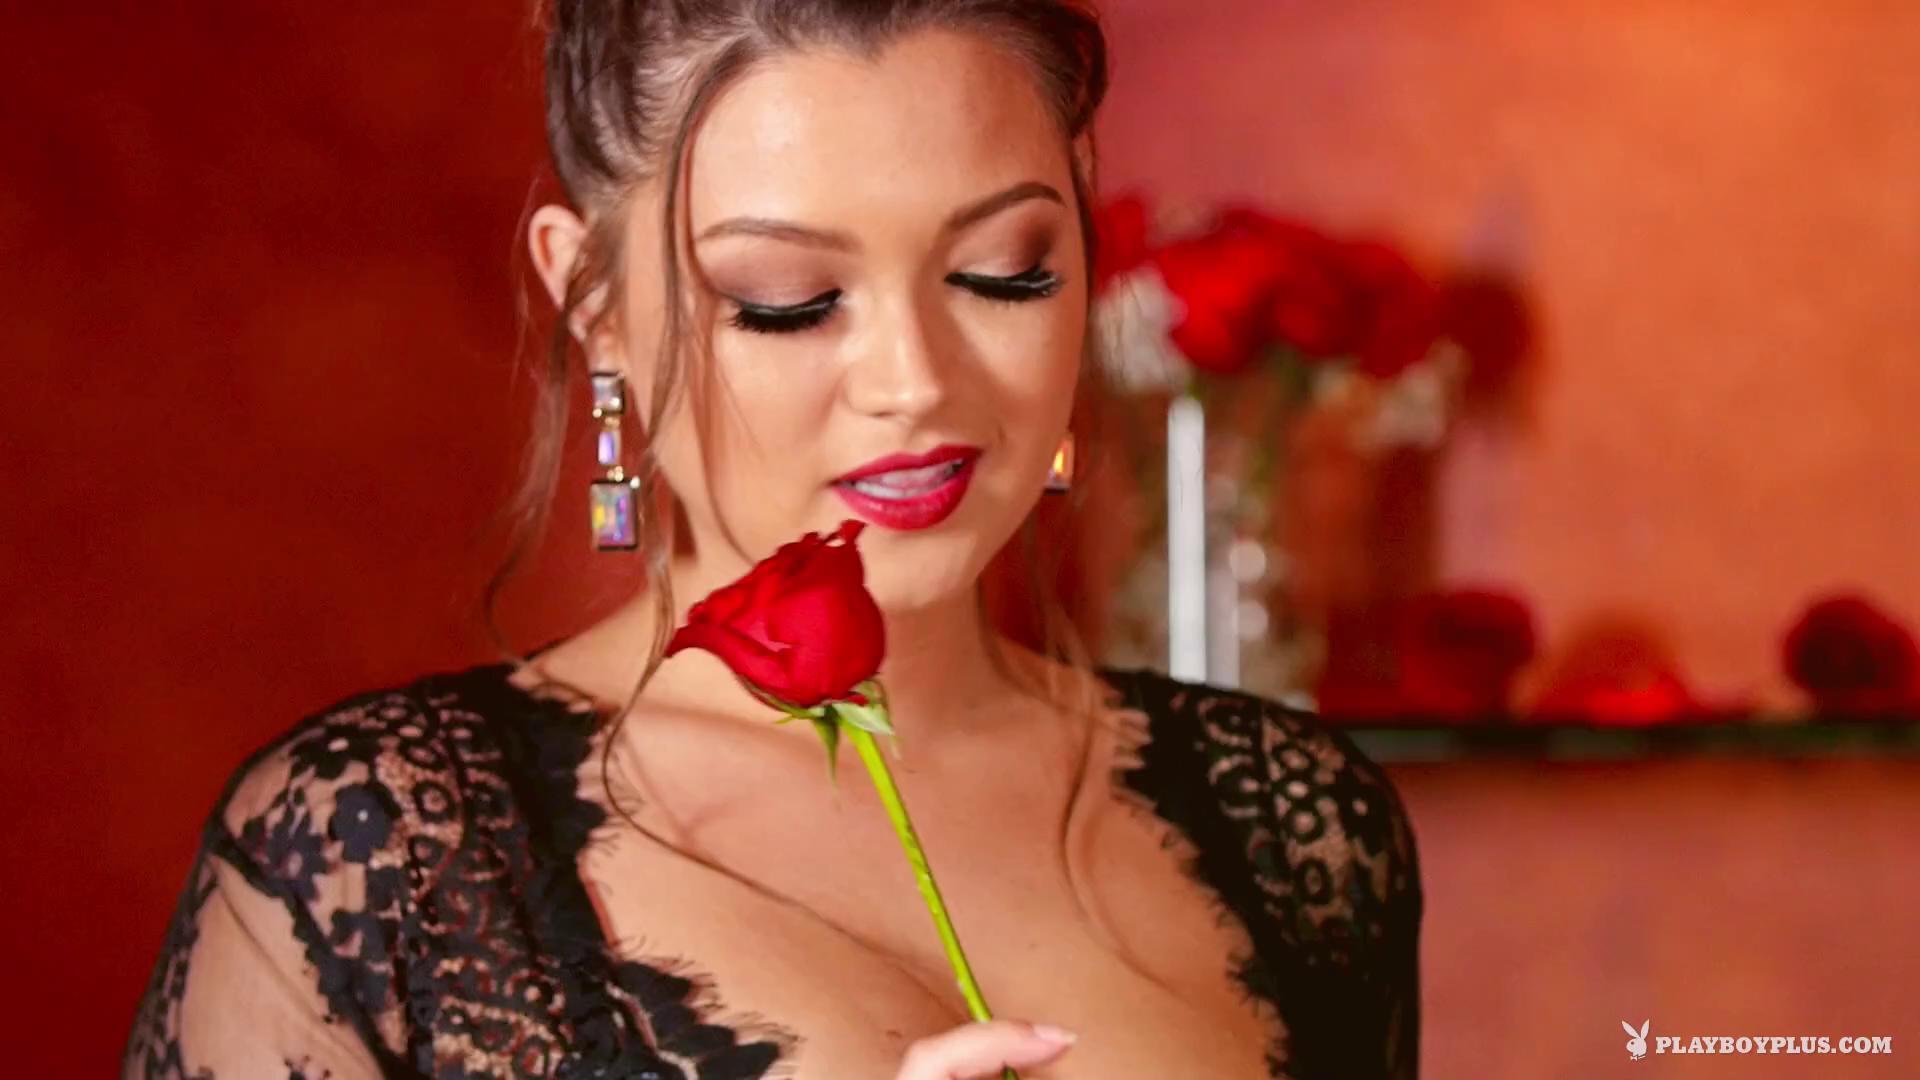 PlayboyPlus – Chelsie Aryn Roses Are Red